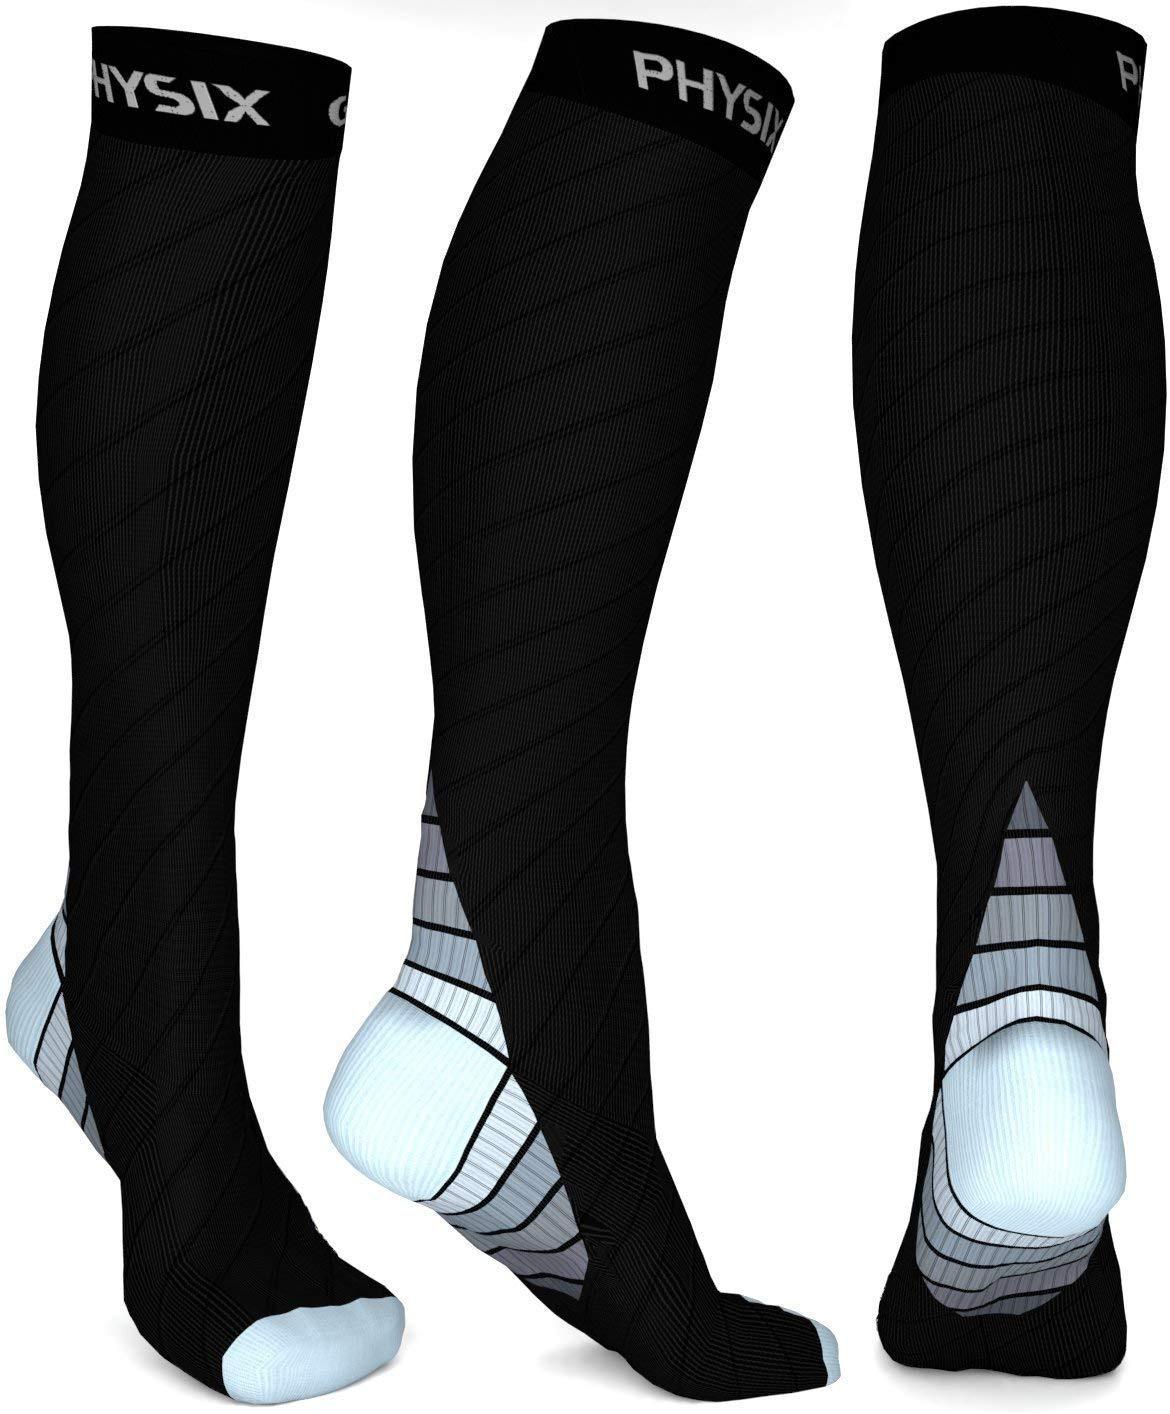 Physix Gear Compression Socks